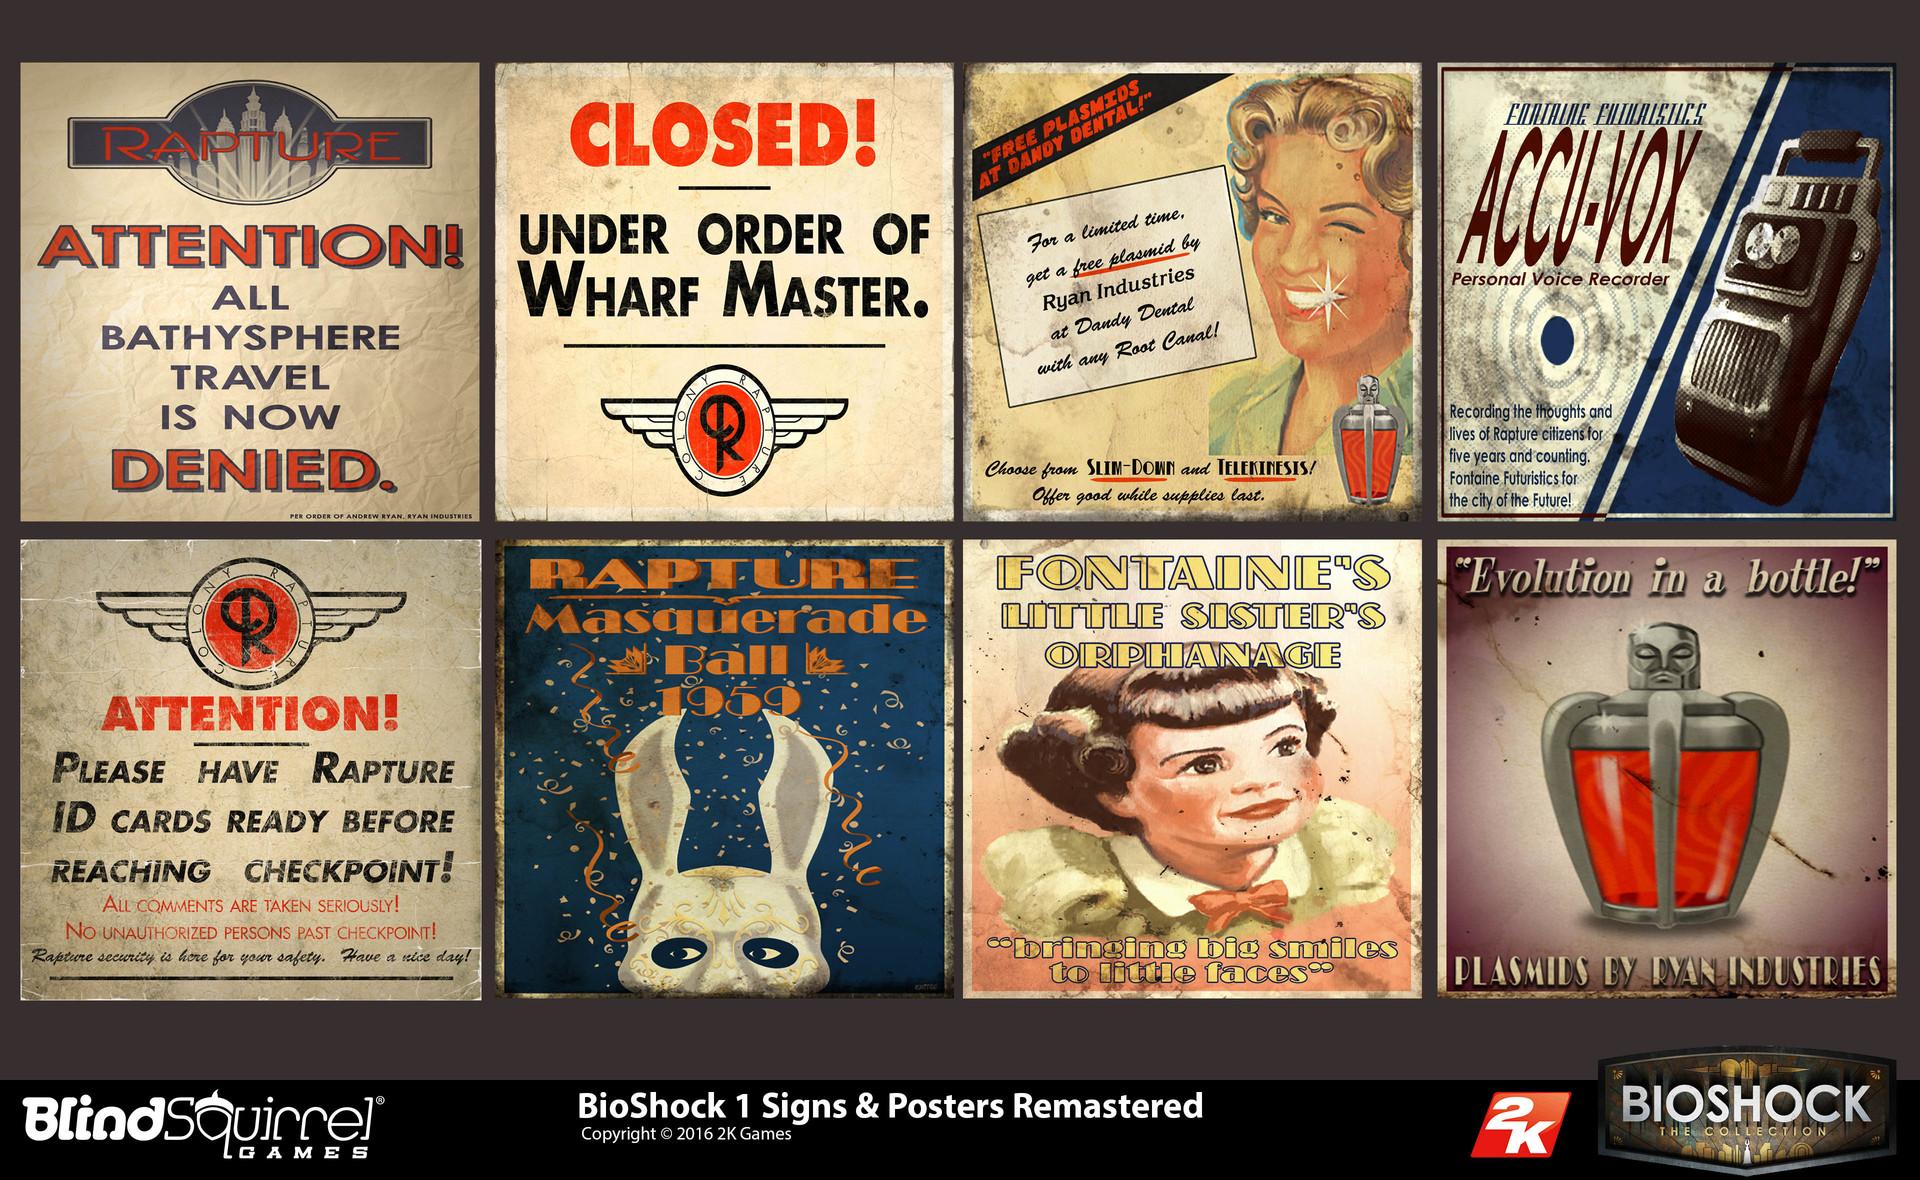 Jeff zugale b1 signage remasters 2